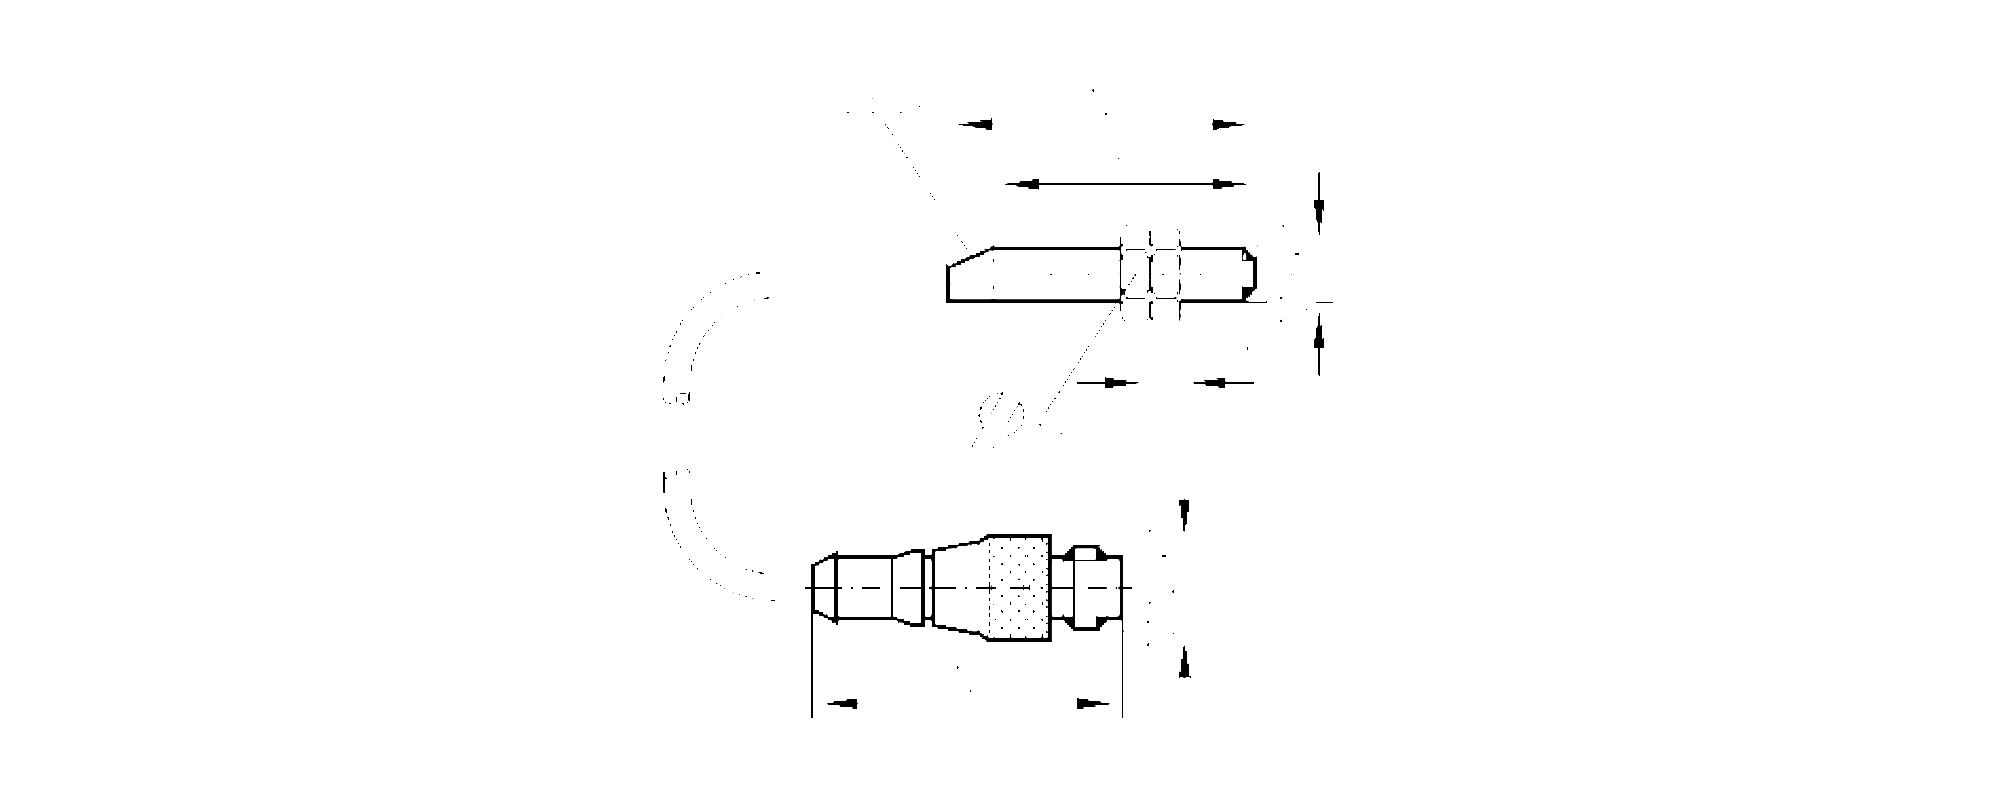 ie9902 - inductive sensor